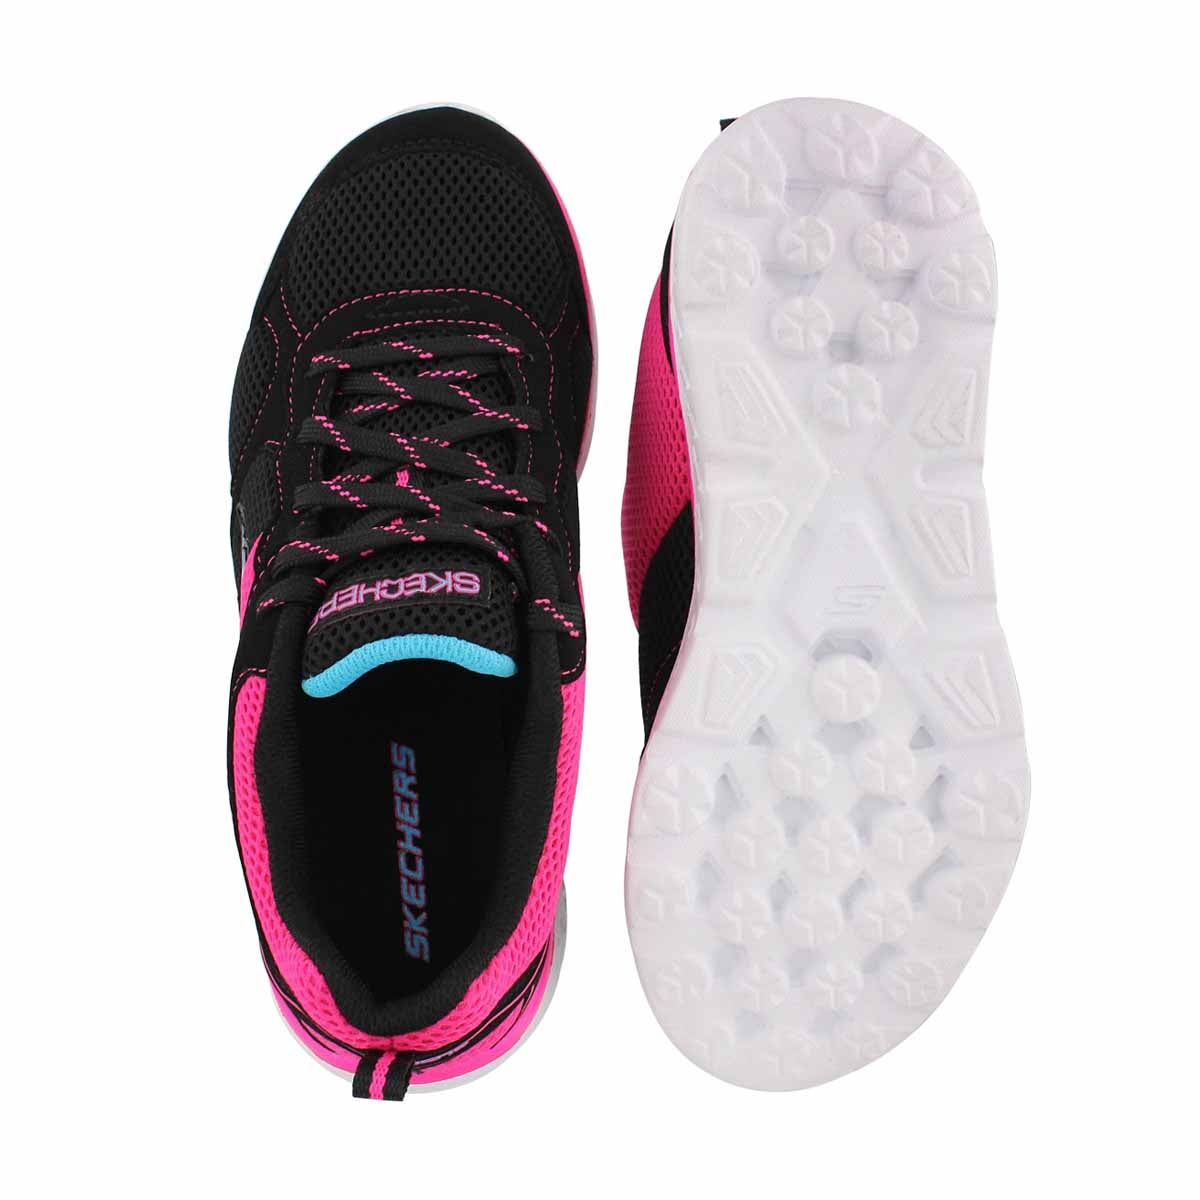 Grls GORun 400 black/pink sneaker